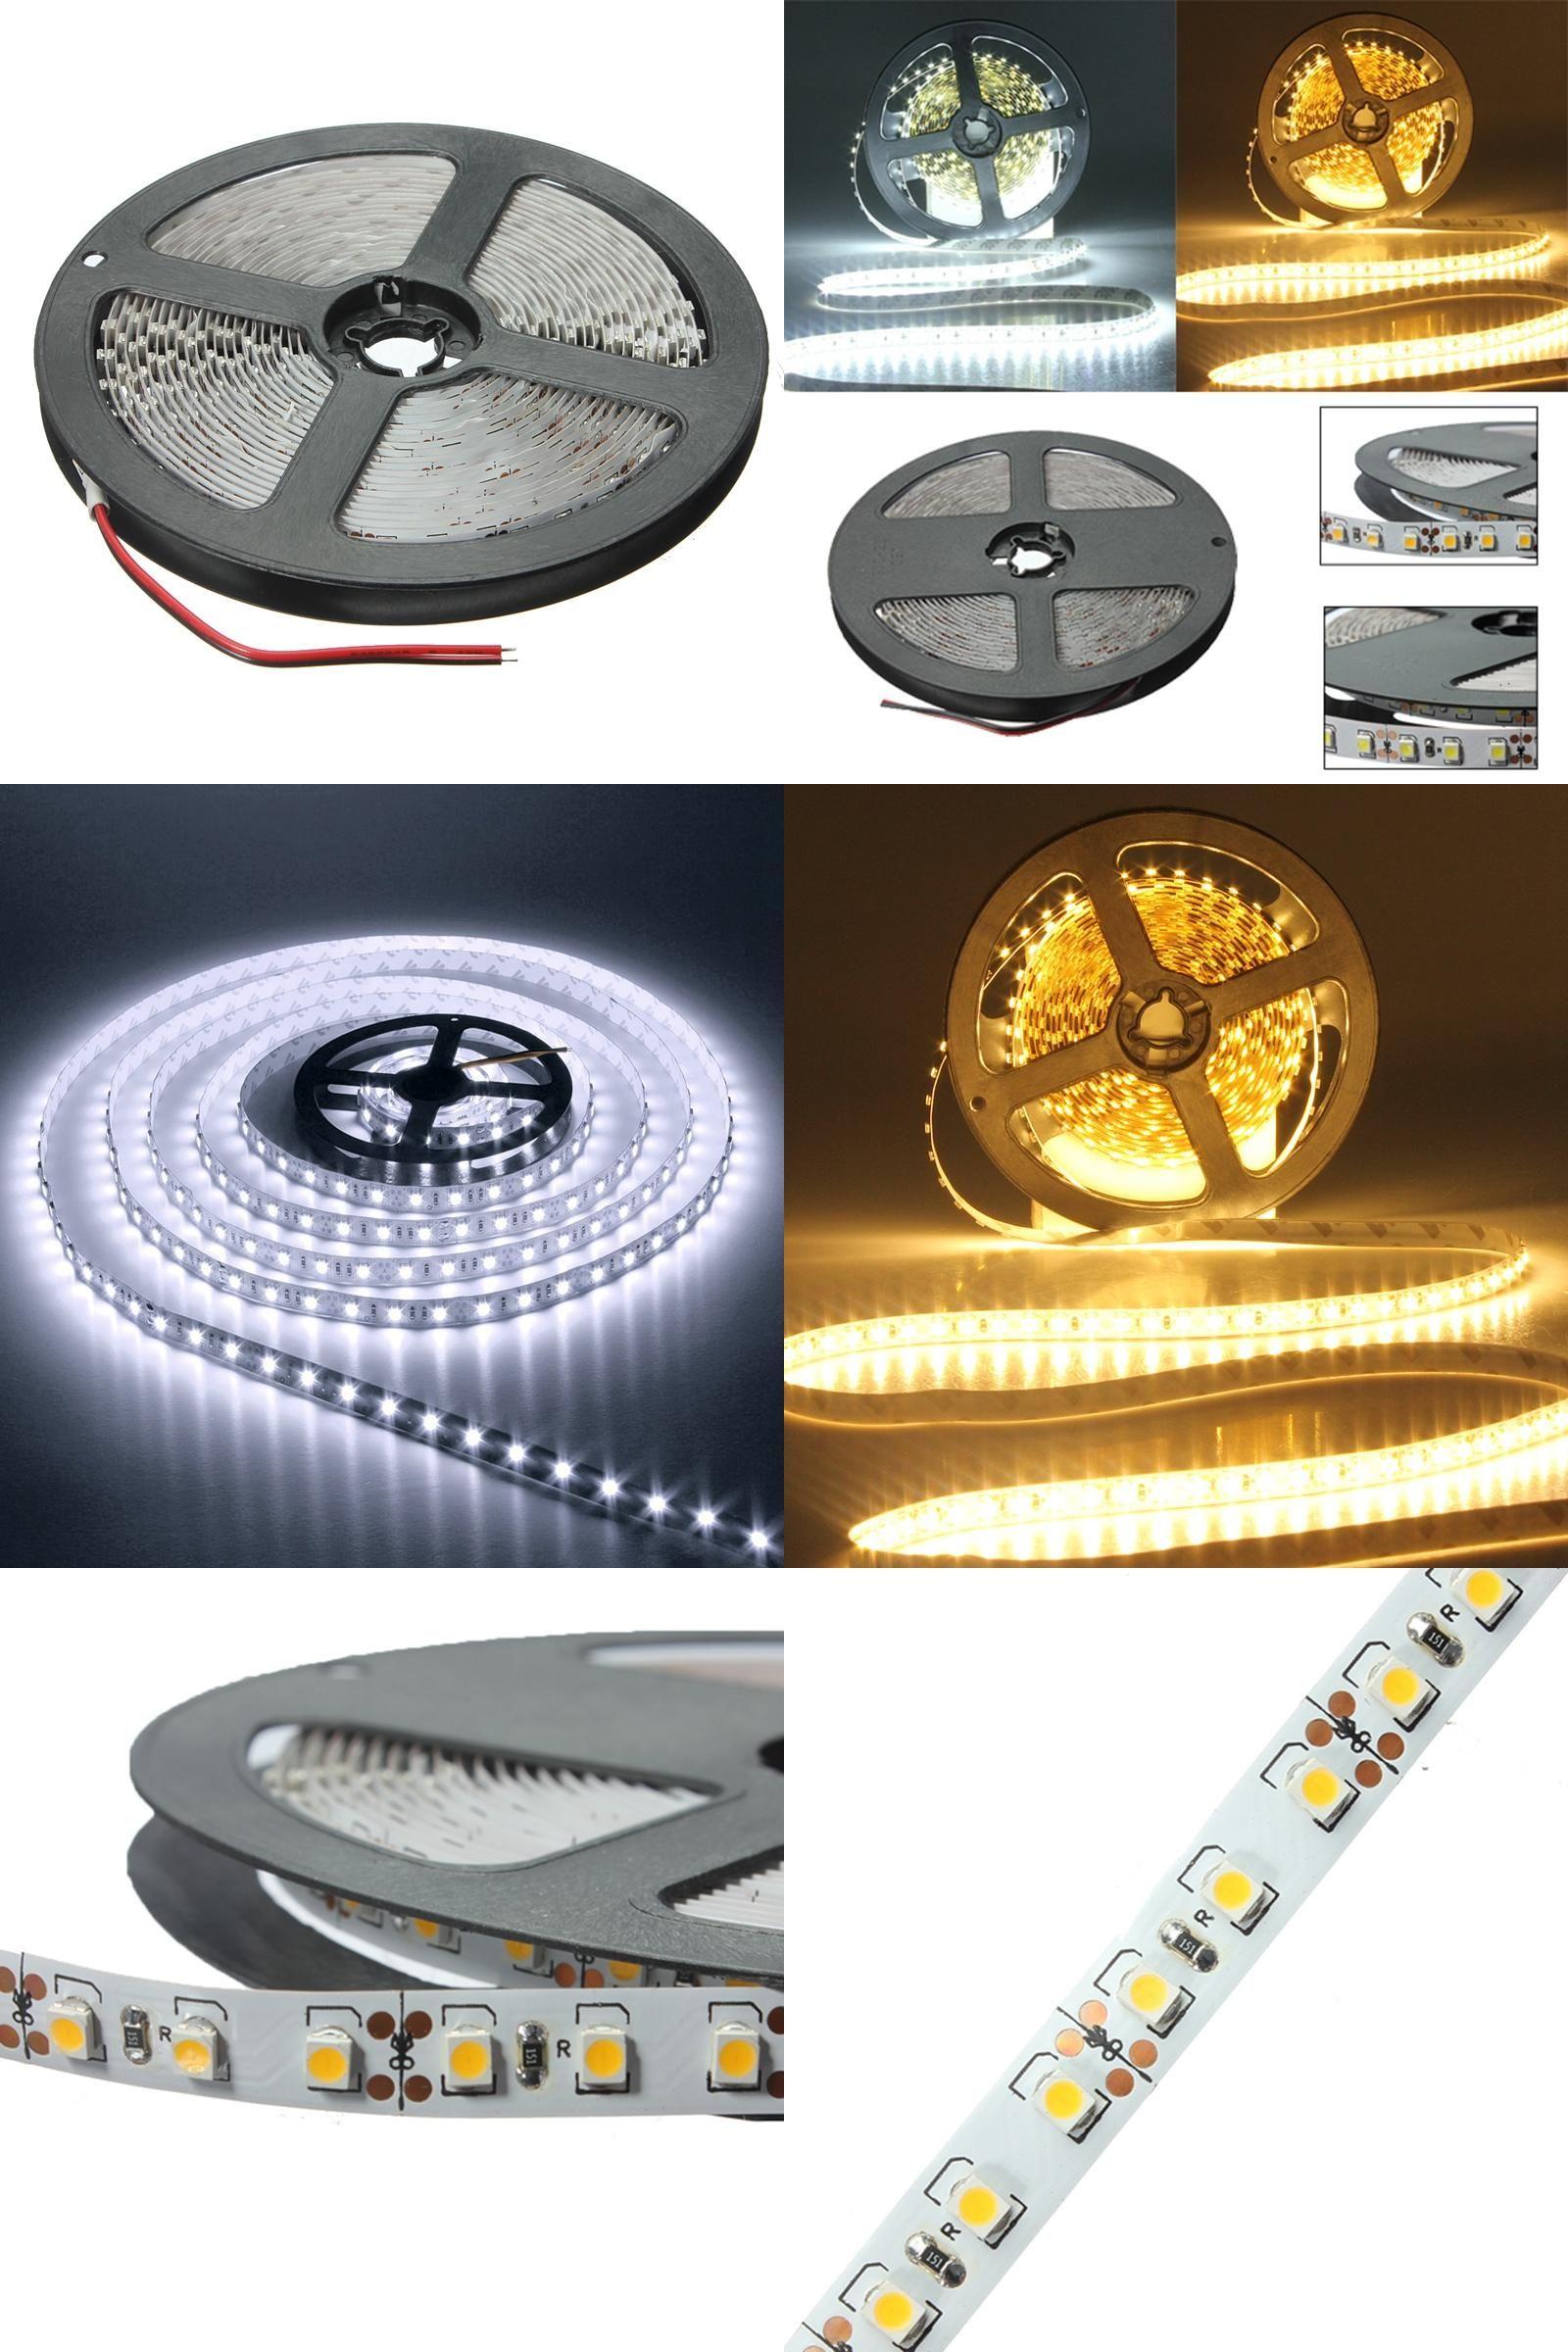 Visit to Buy] 5M 600 LED 3528 SMD Flexible Strip Tape Light Non ...